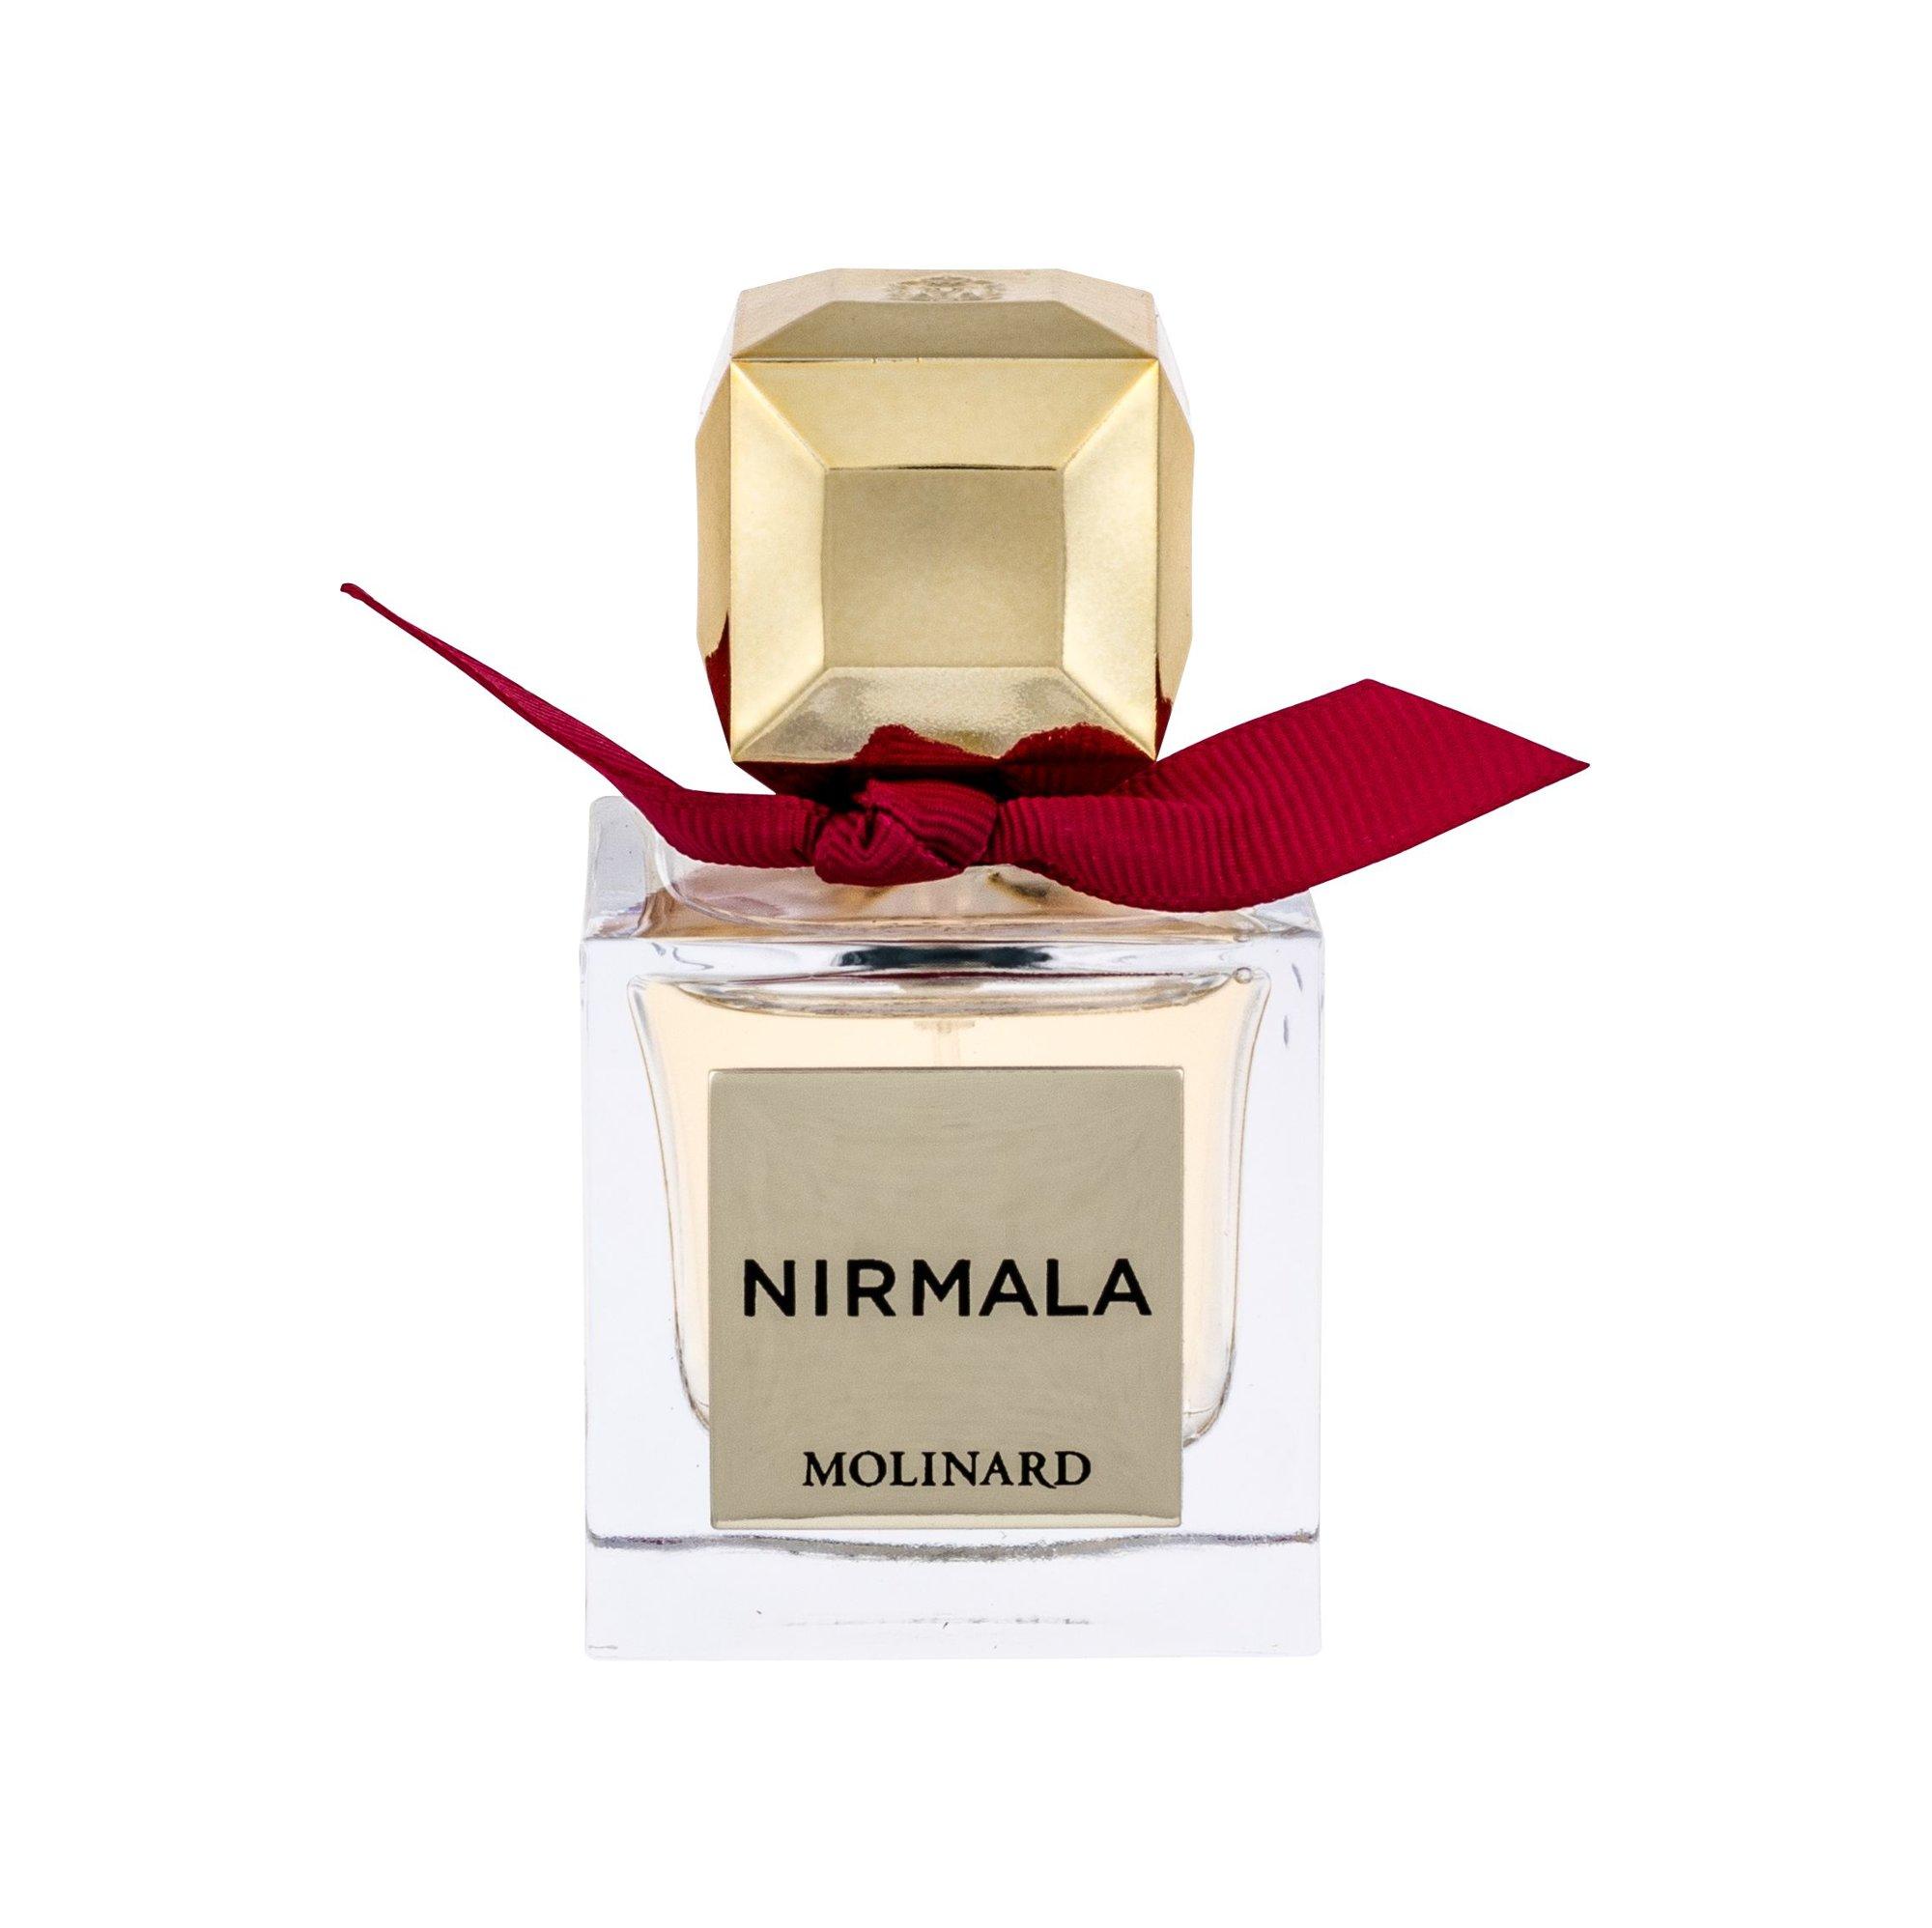 Molinard Nirmala Eau de Parfum 30ml  2017